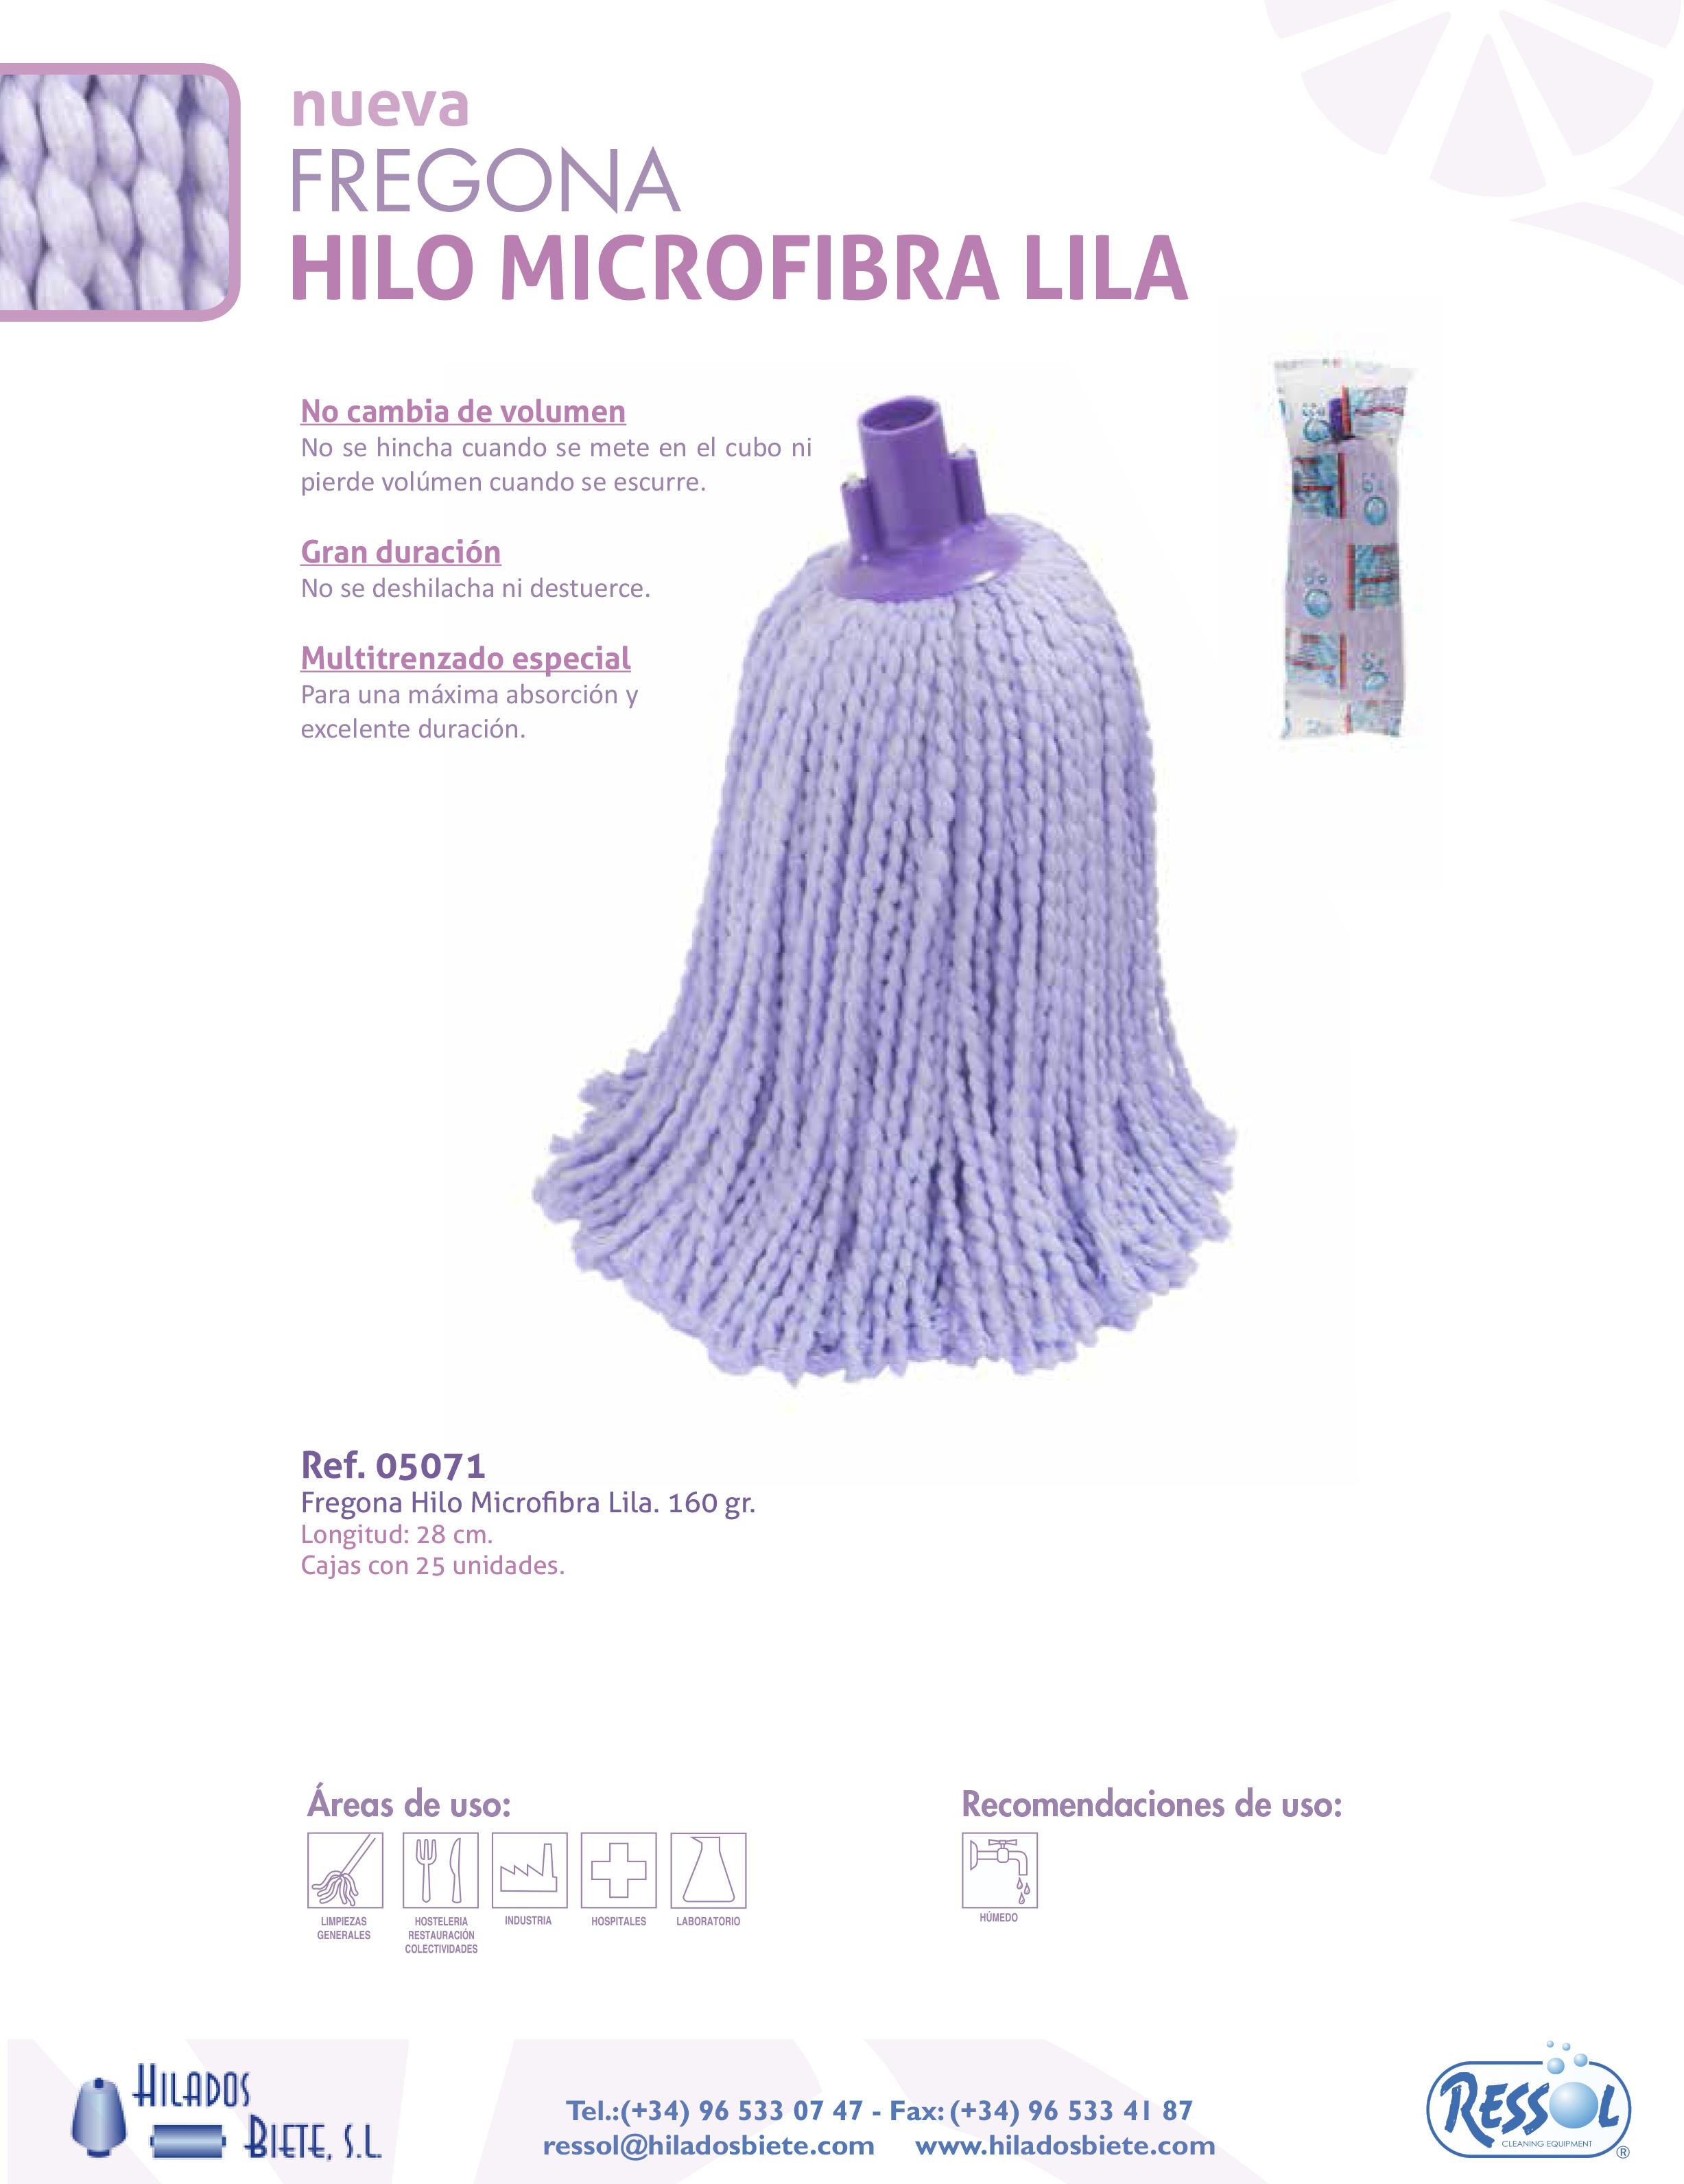 Fregona Microfibra Hilo Lila